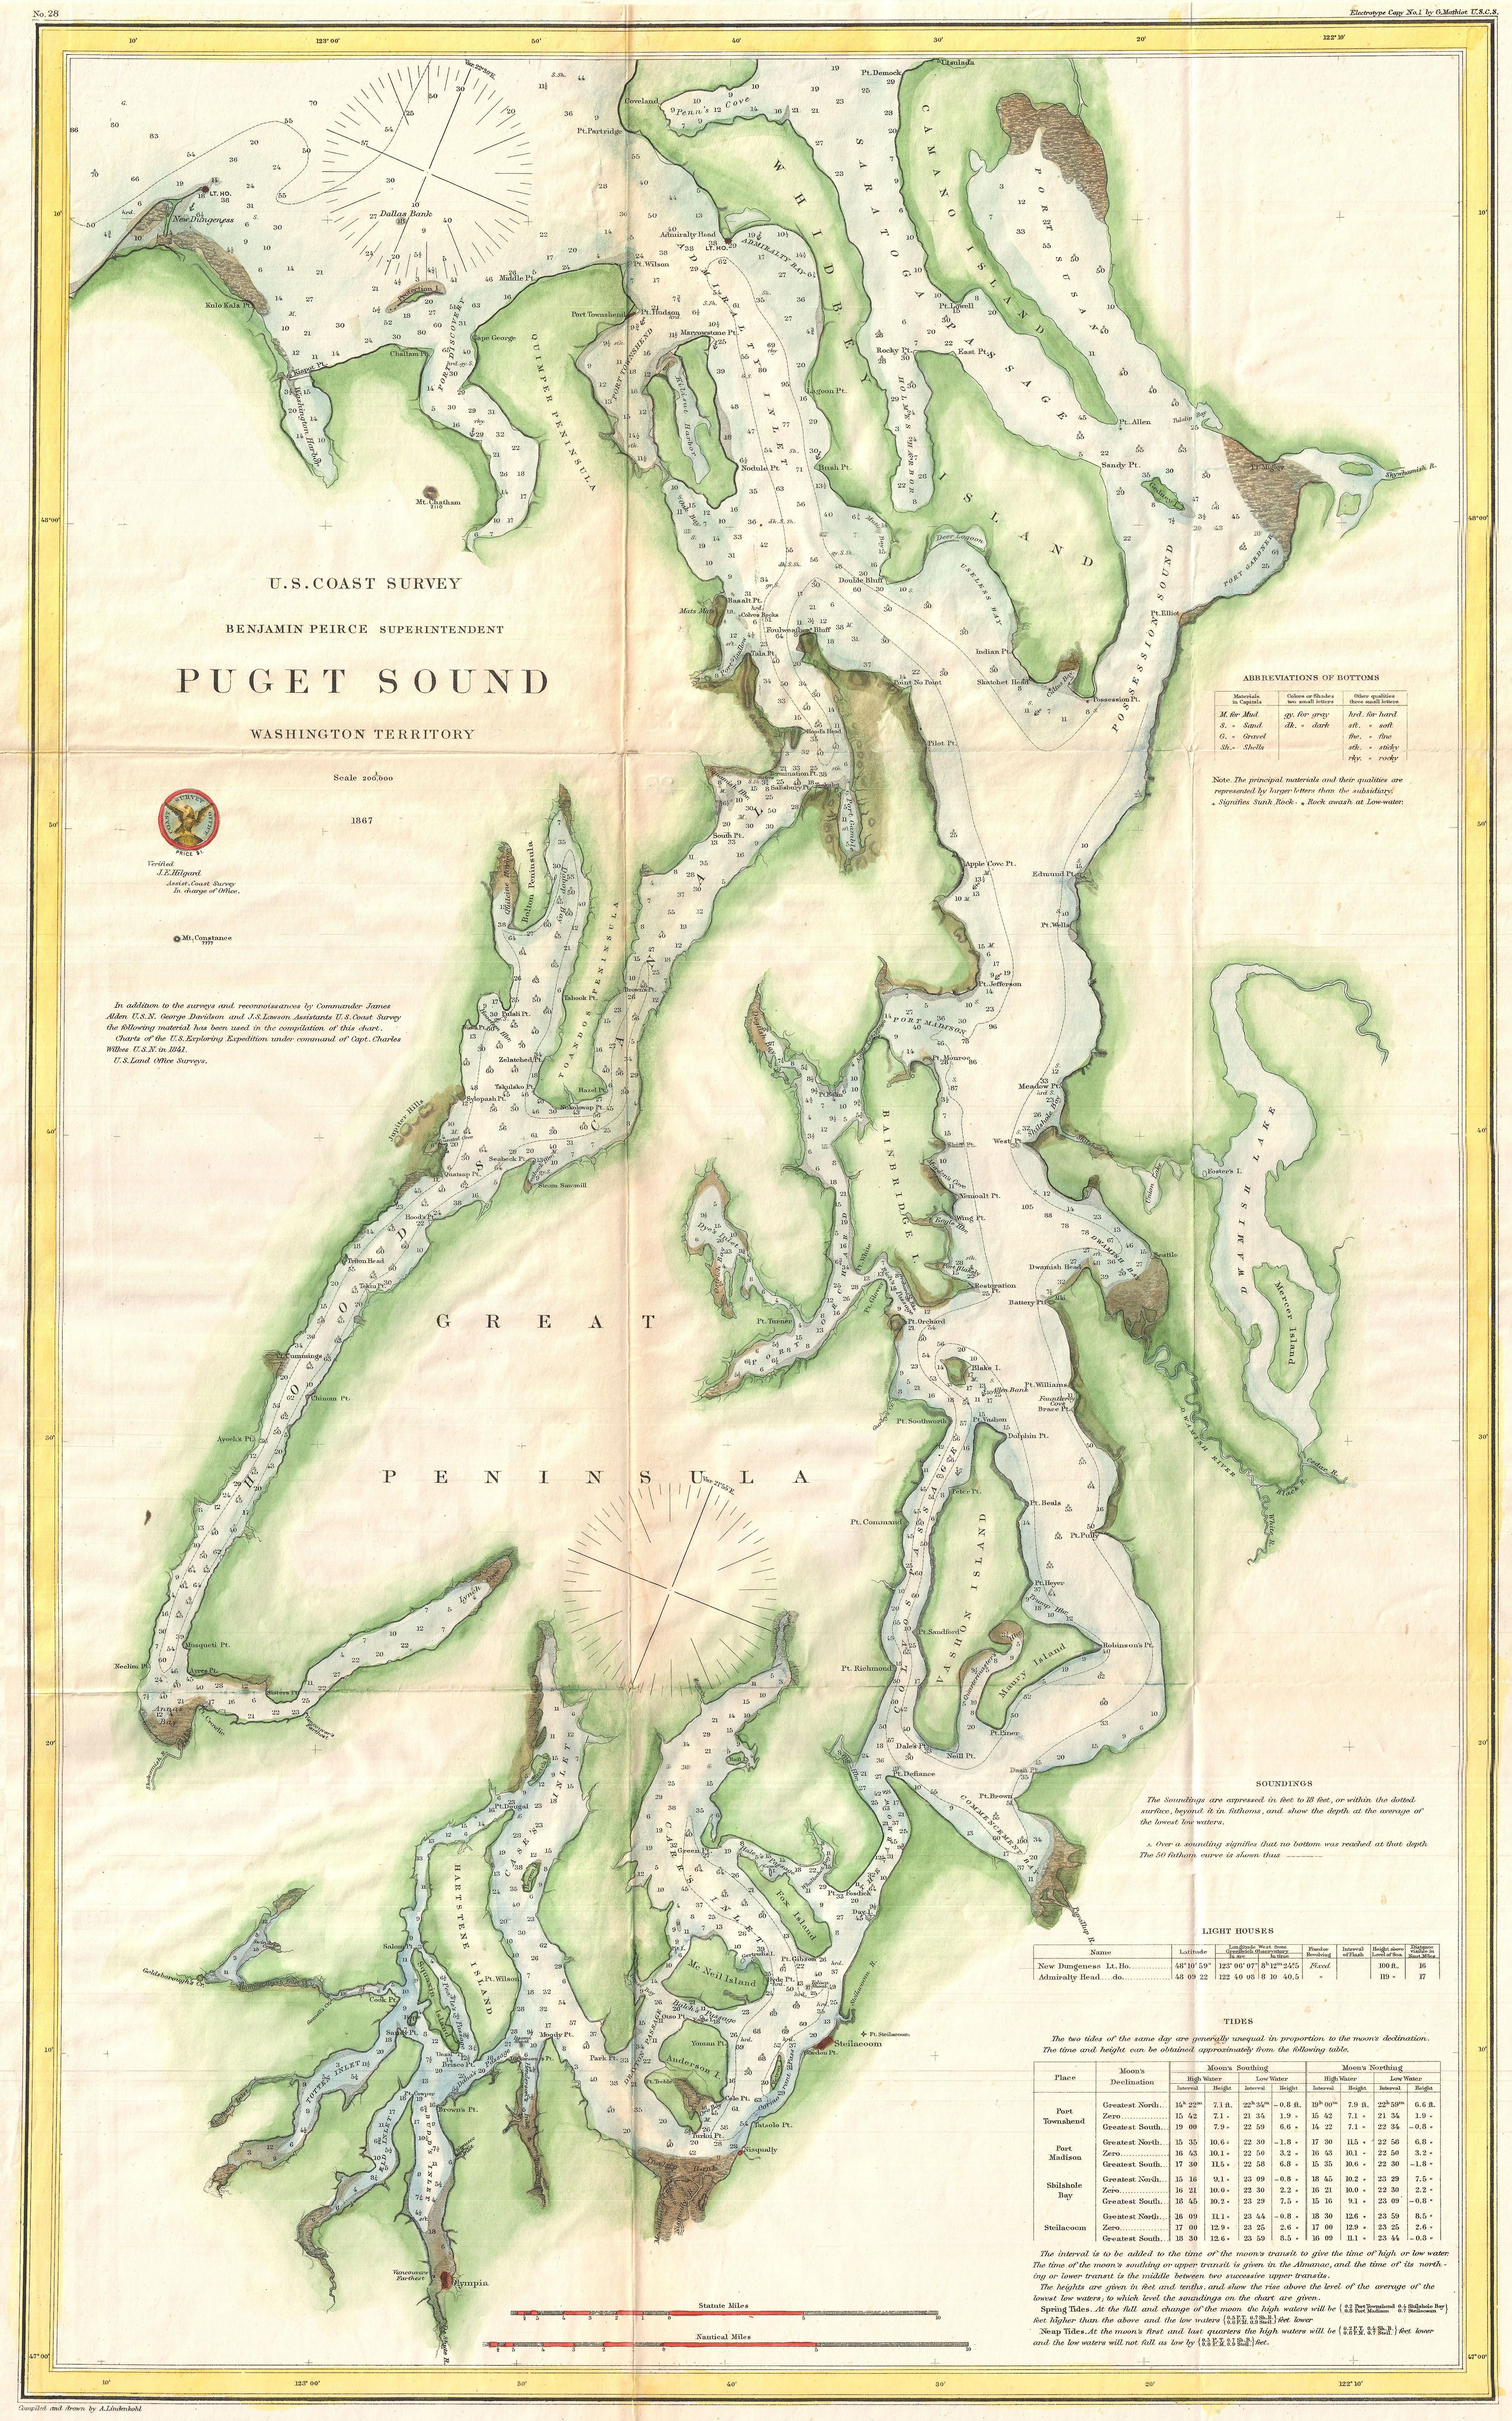 Puget Sound Ideas Themes Pinterest Coast Guard - Us coast guard maps